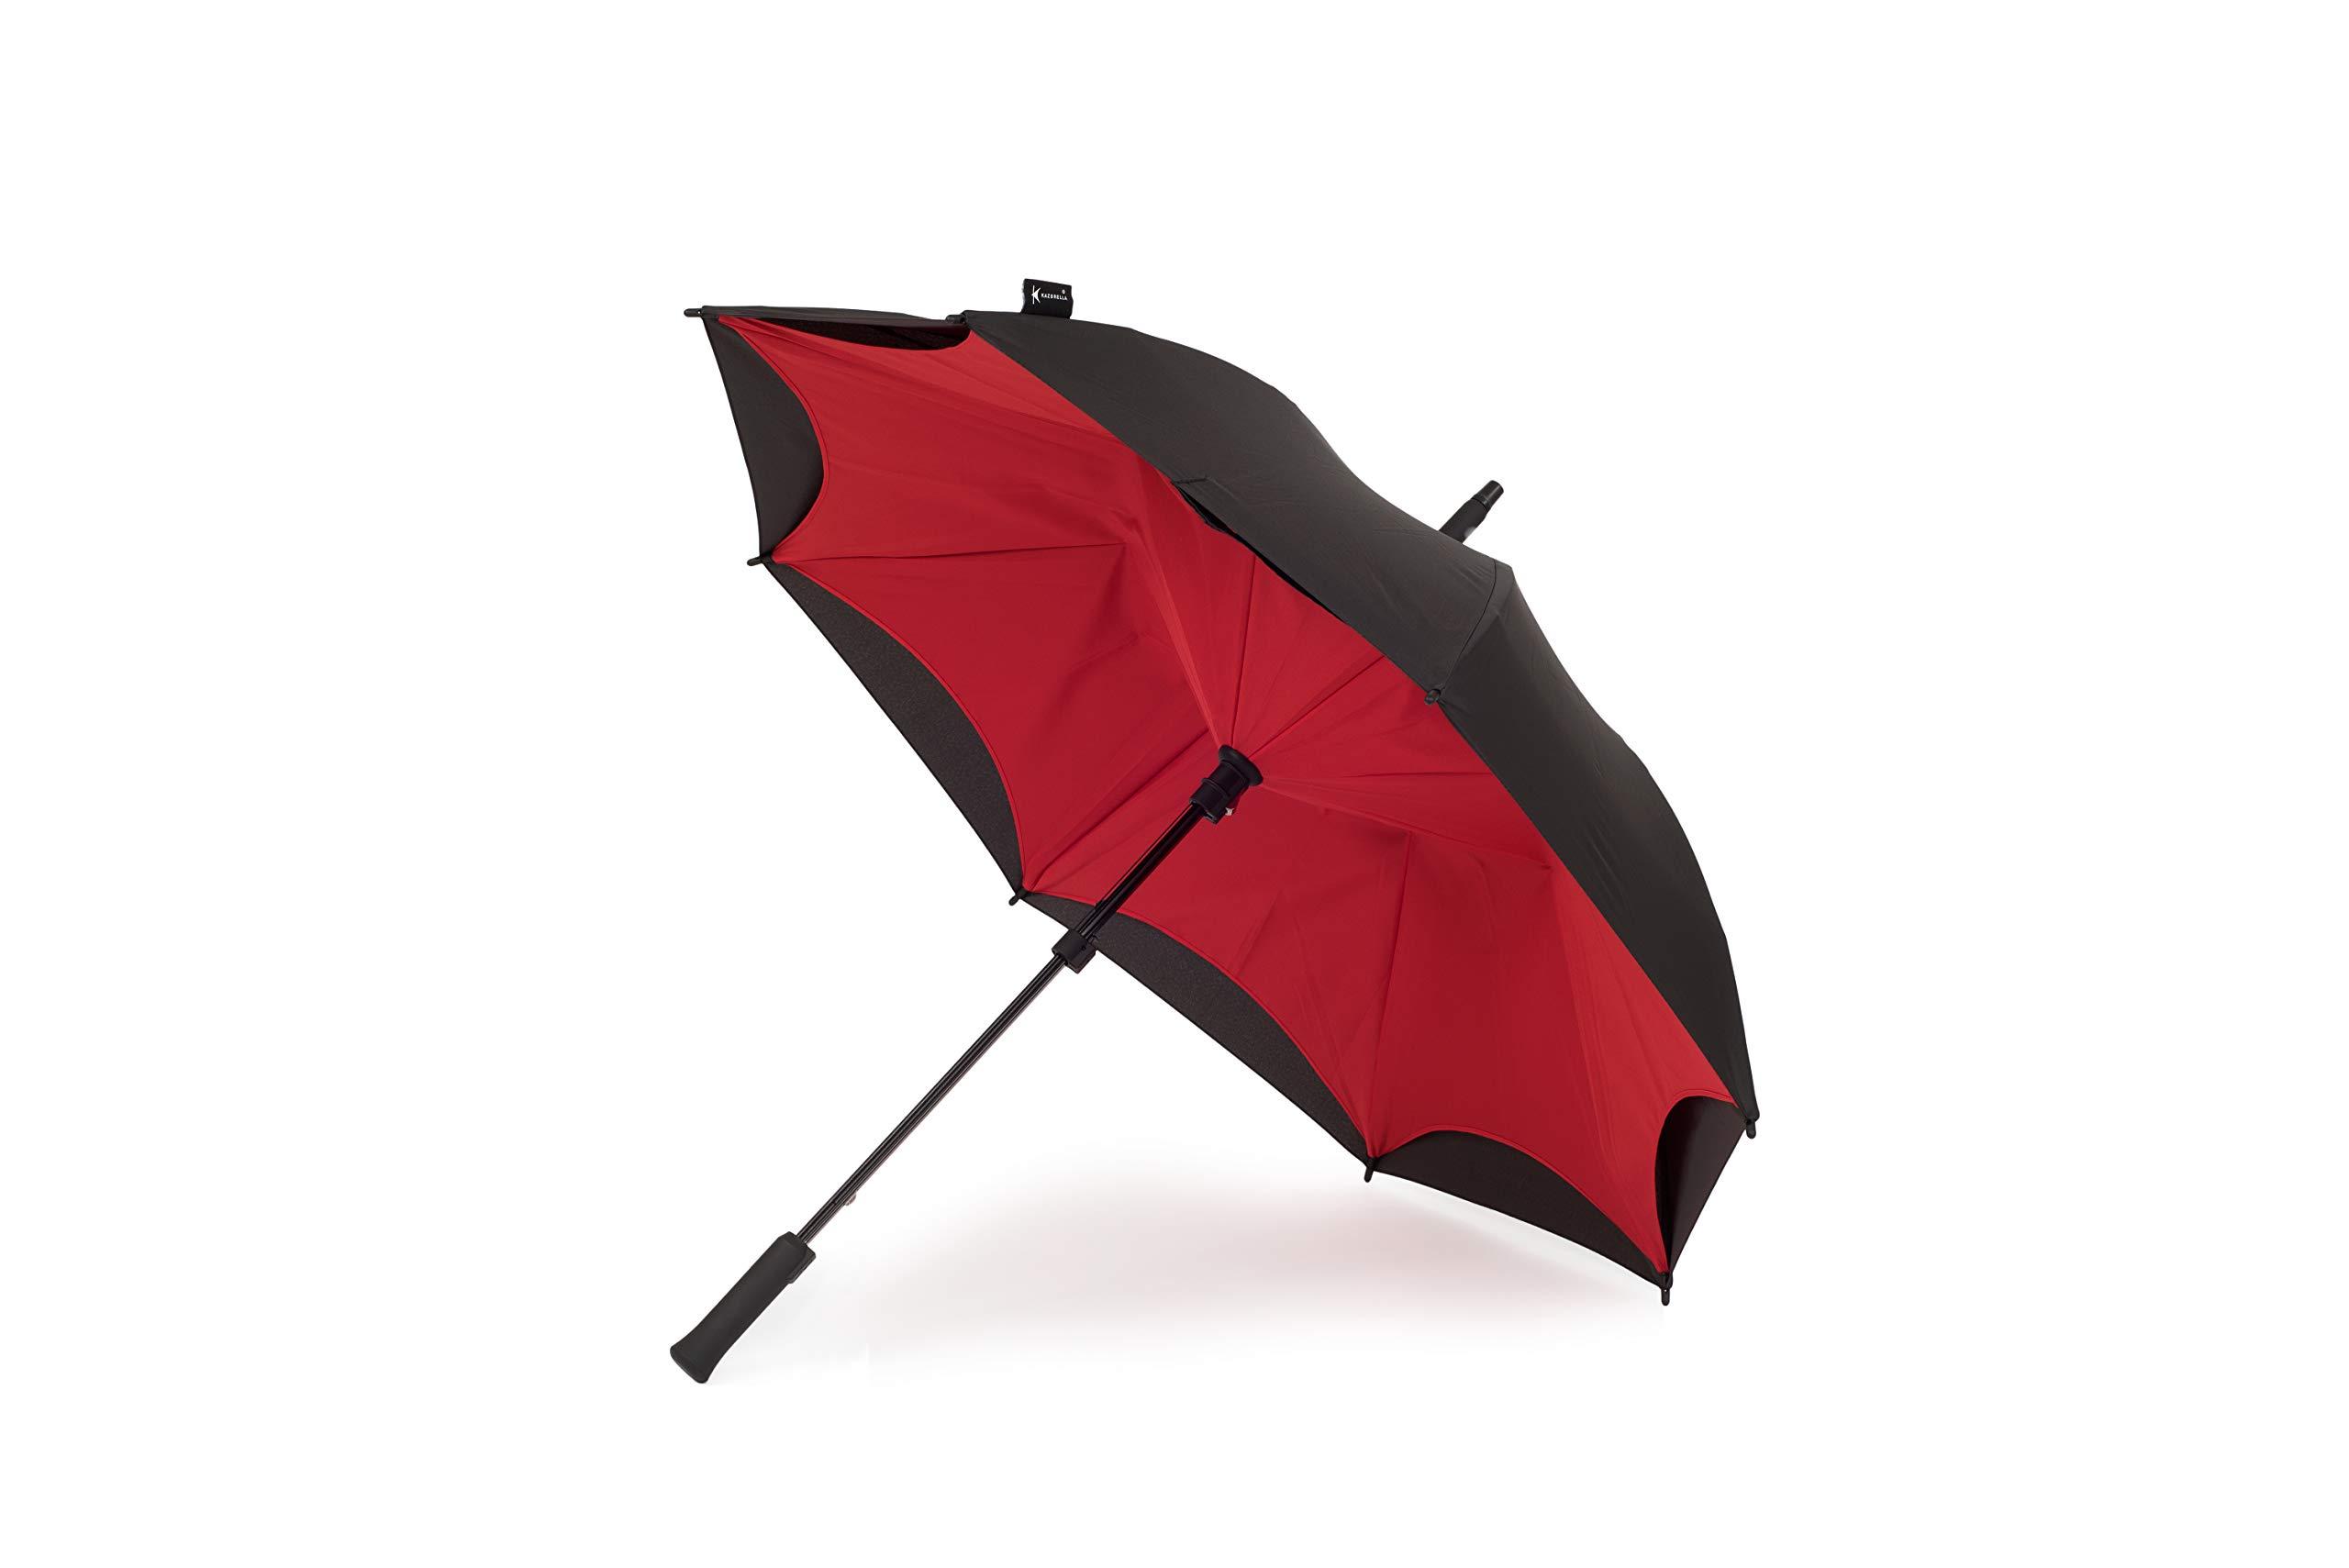 Orginal Kazbrella Reverse Folding Inverted Umbrella Double Layer Wind Proof UV Proof (Red + Black (straight handle)) by KAZBRELLA